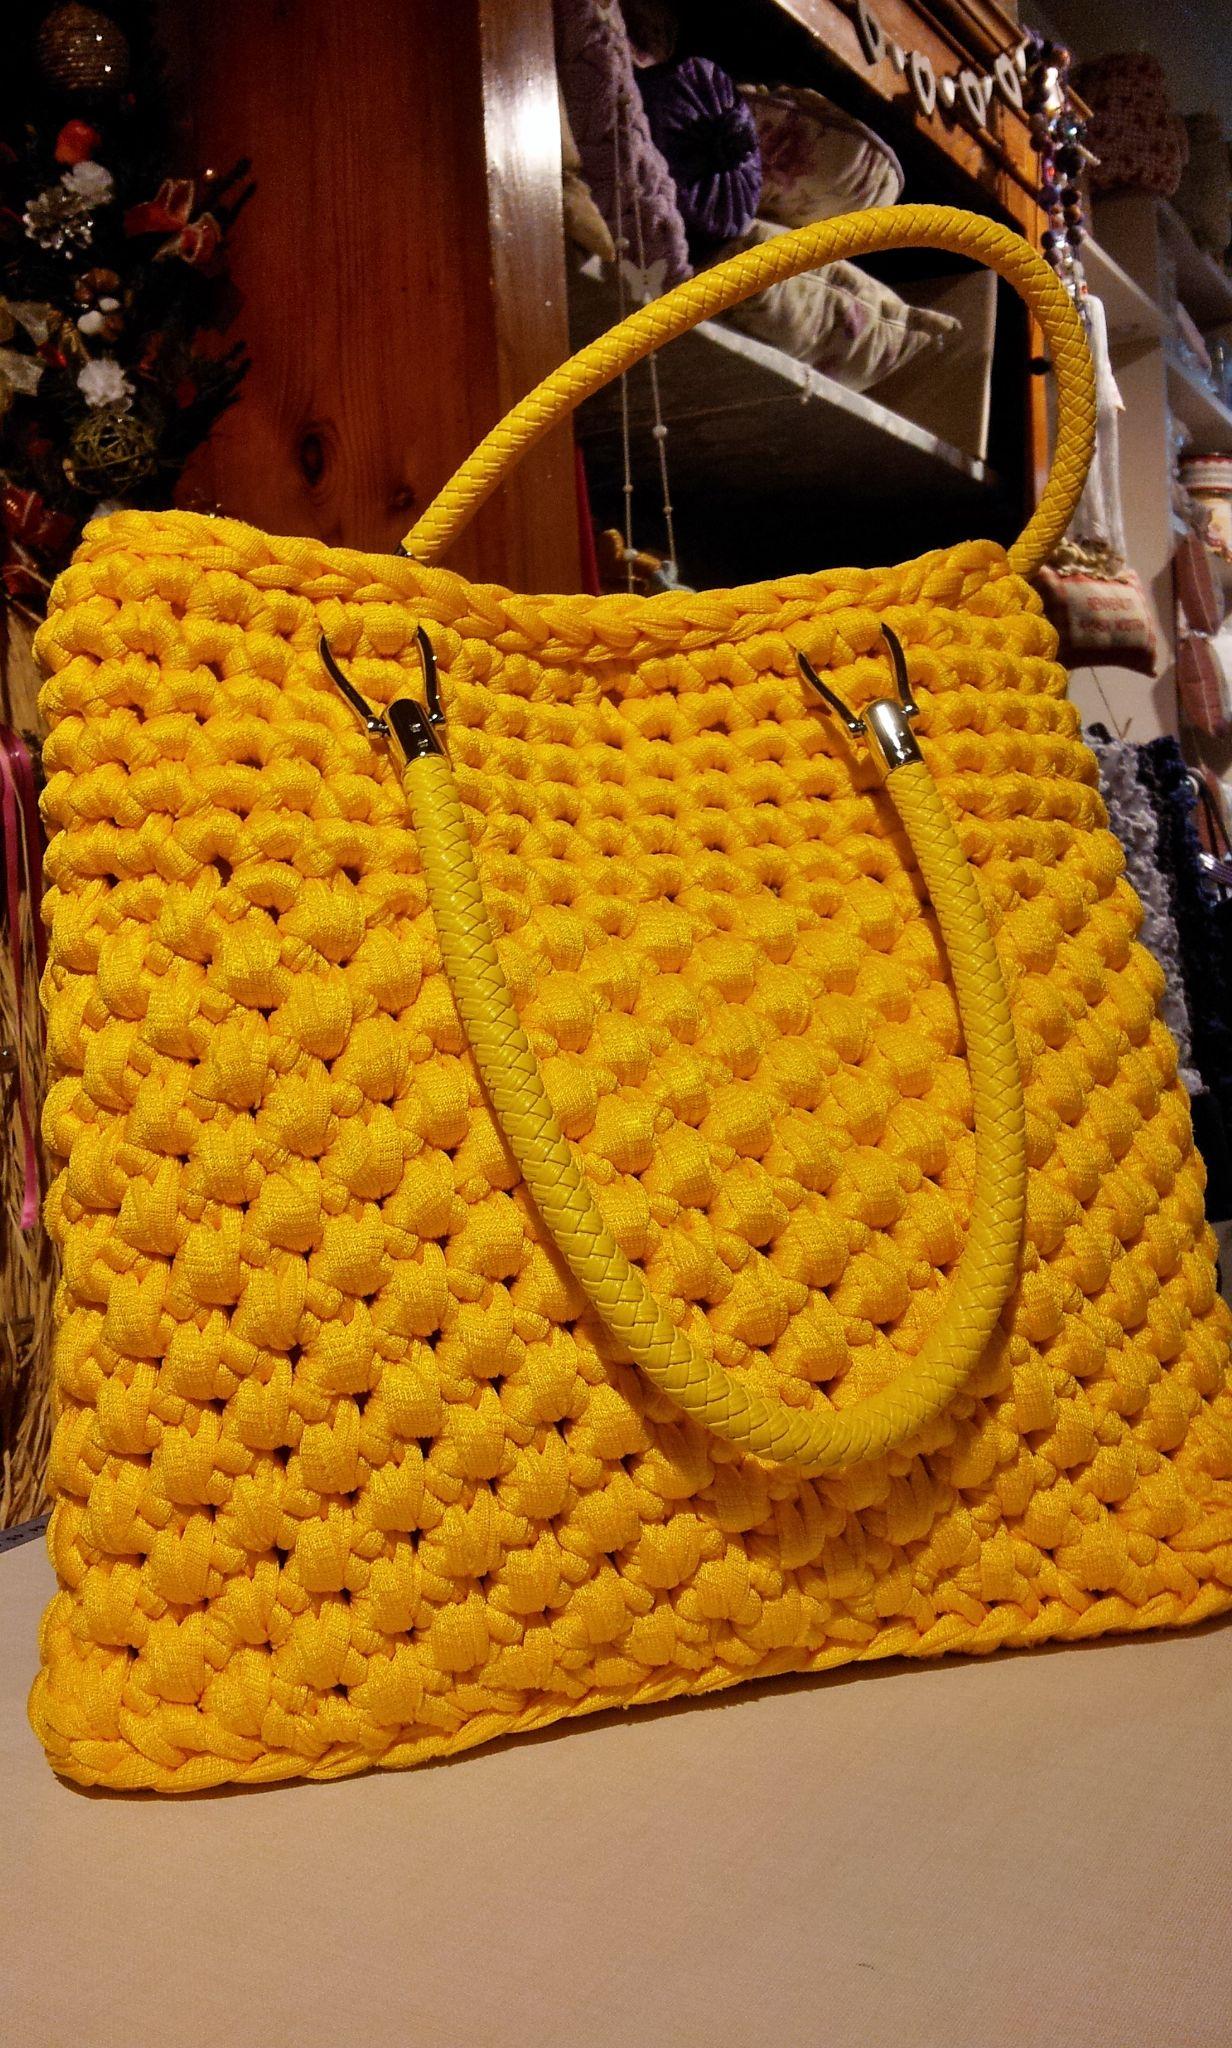 1000 images about fettuccia on pinterest crochet bags for Borse in fettuccia tutorial